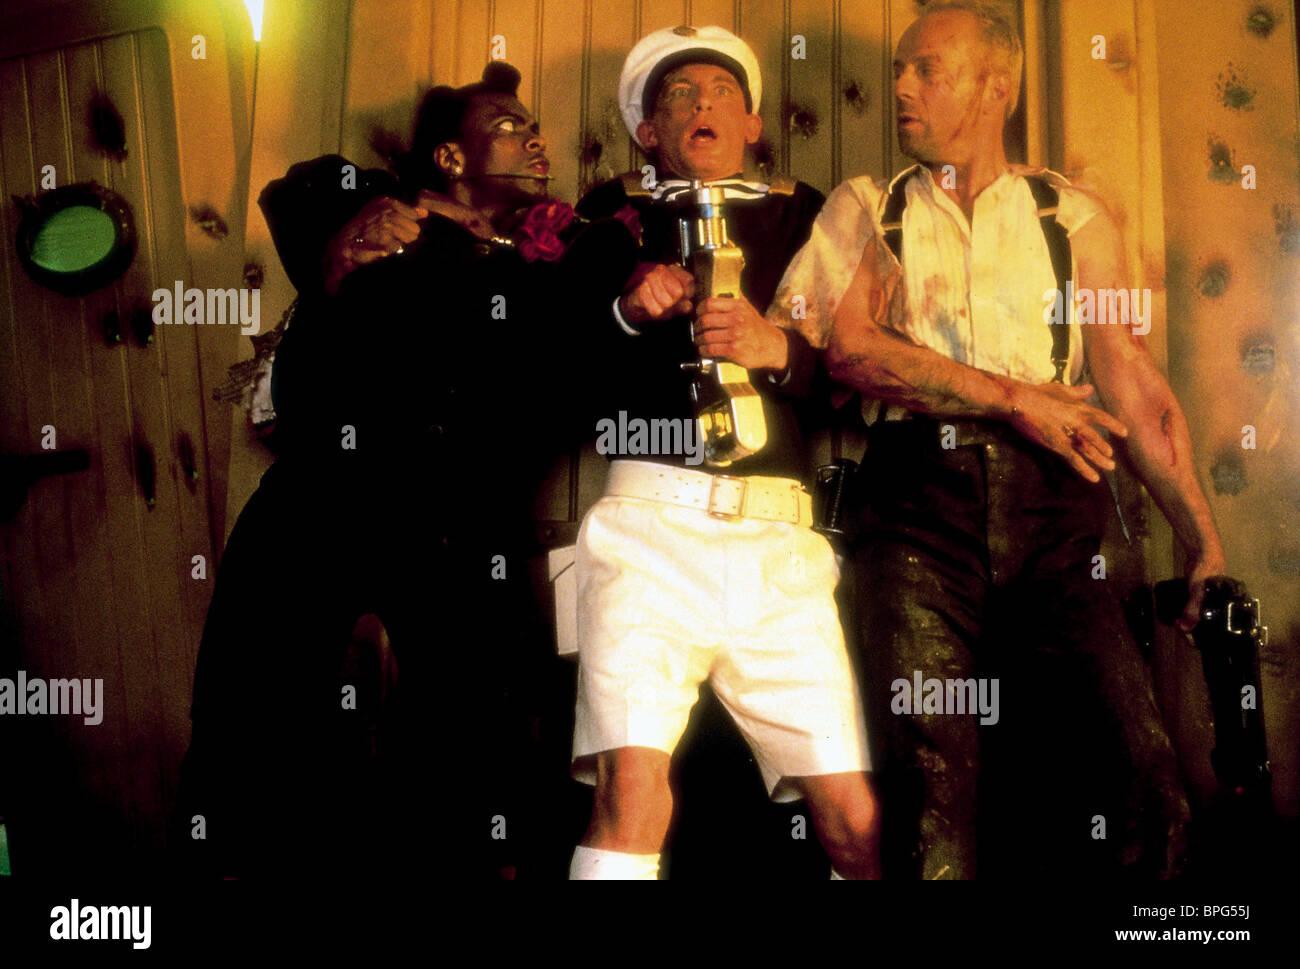 Chris Tucker Lee Evans Bruce Willis The Fifth Element 1997 Stock Photo Alamy